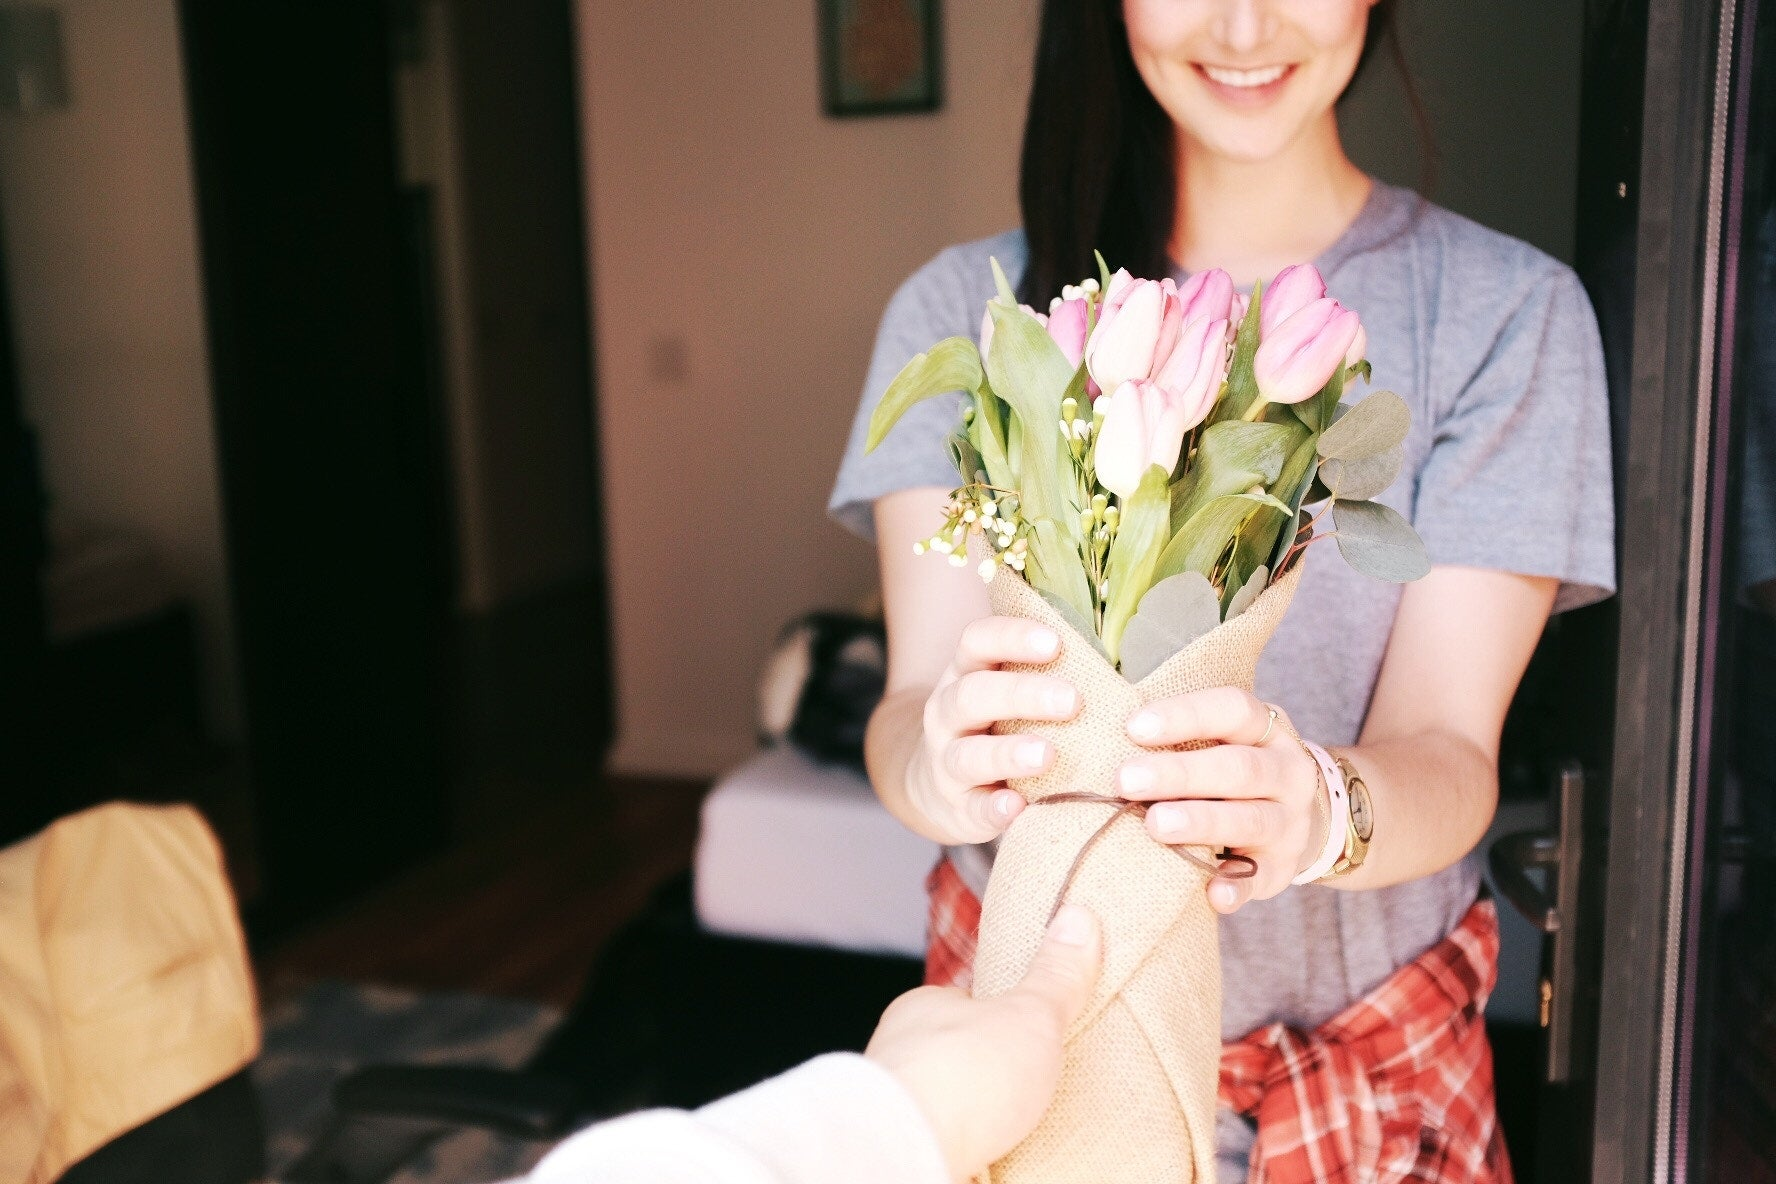 sorpresa coppia - blog viaggi edreams